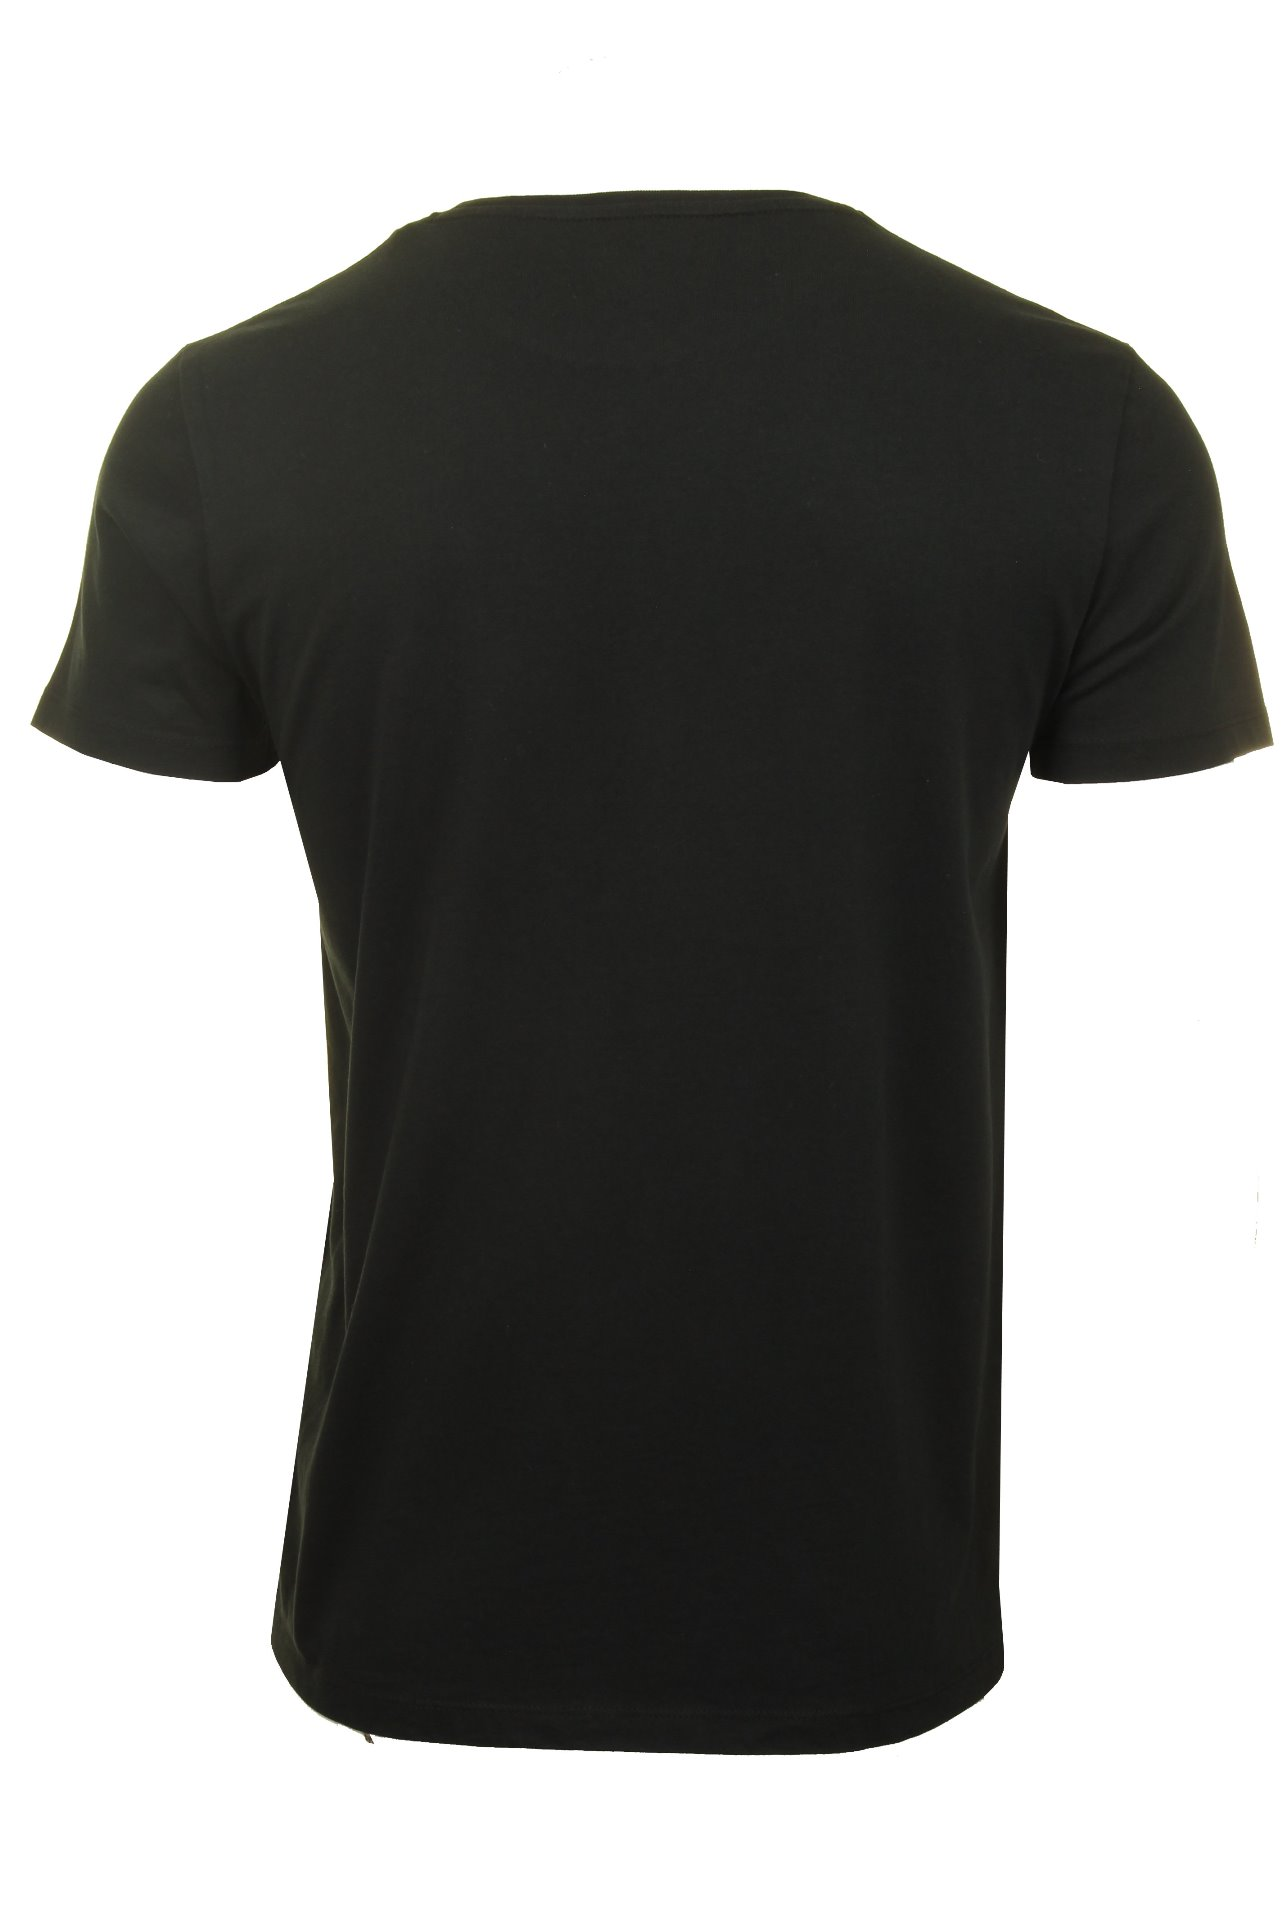 Timberland-Mens-Jersey-T-Shirt-039-Kennebec-Tree-Tee-039-Short-Sleeved thumbnail 5